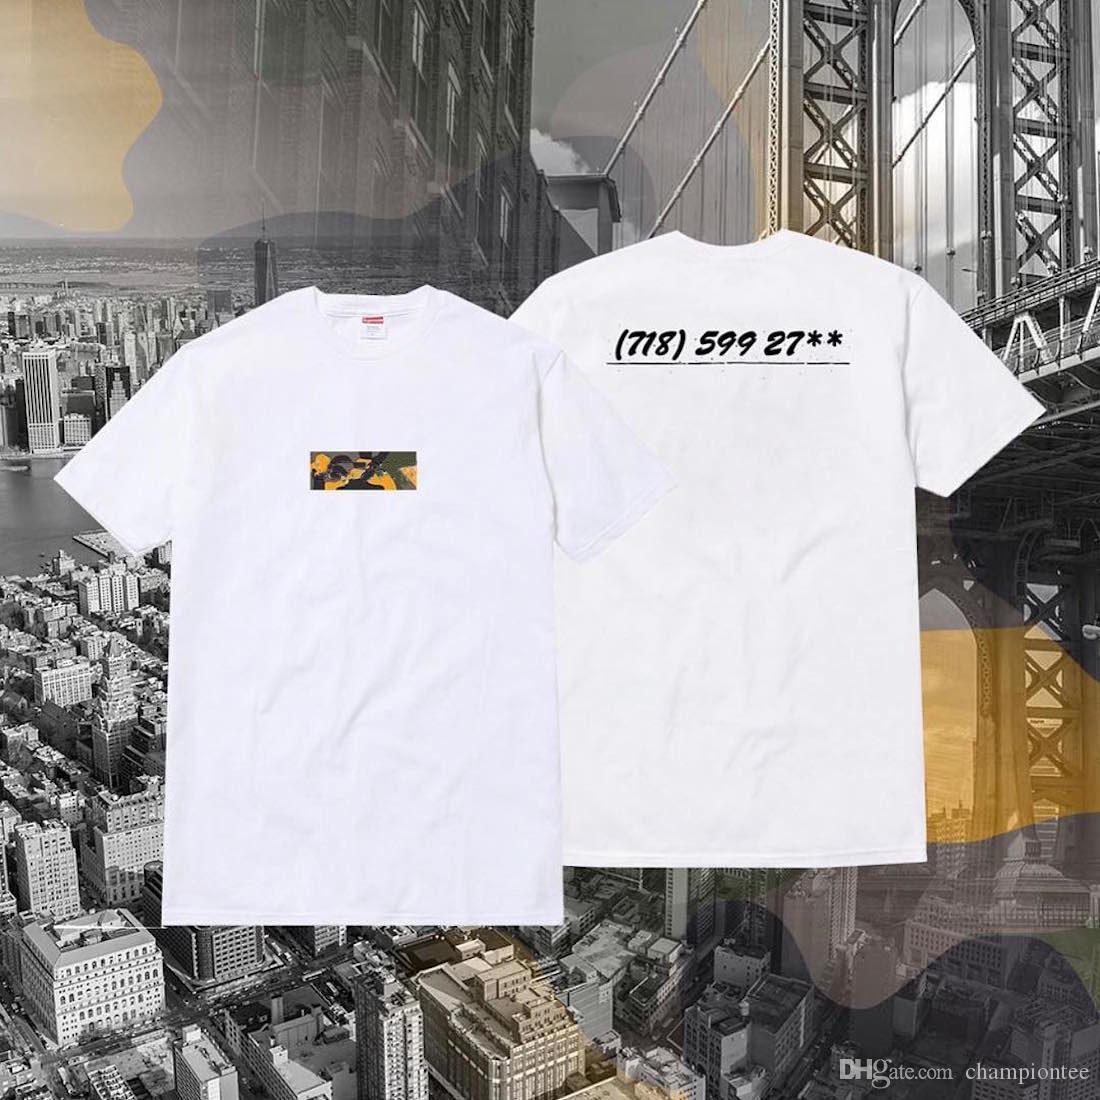 supreme shirt dhgate